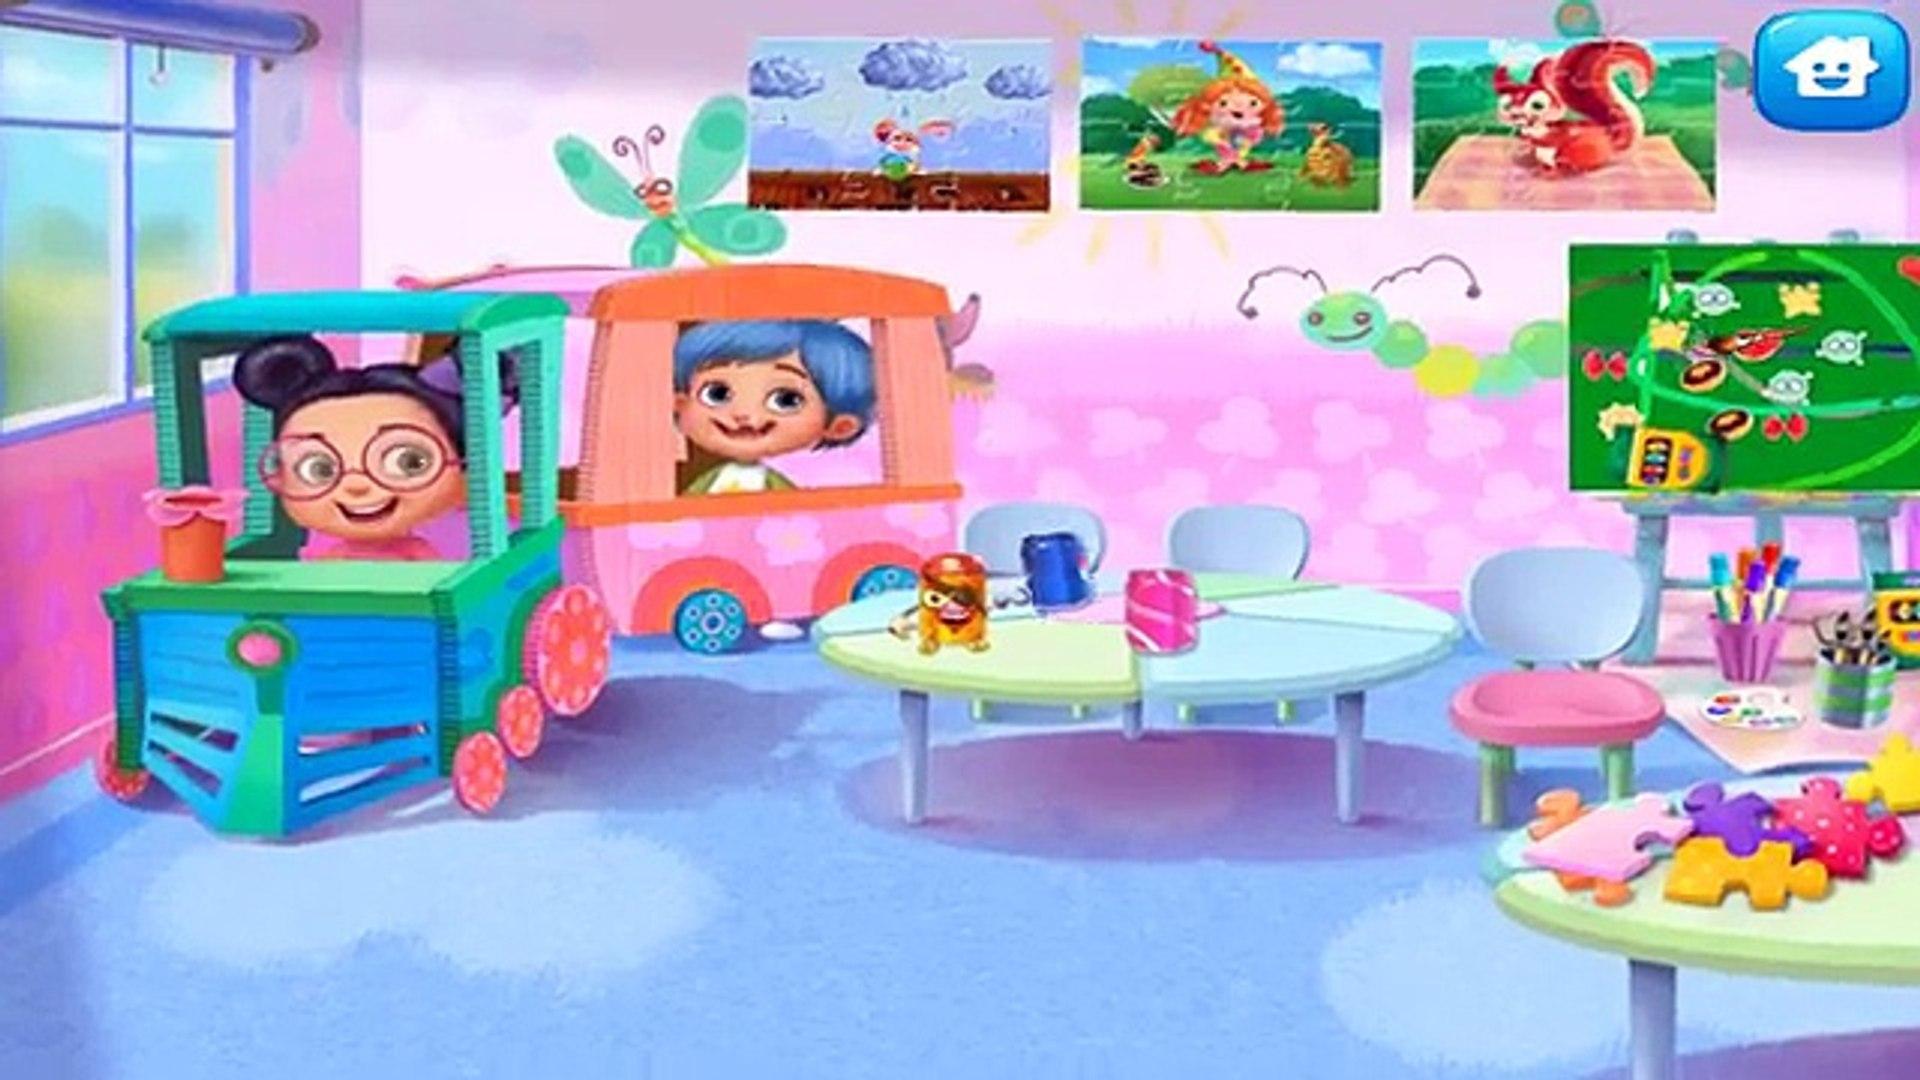 Fun Baby Kids Care Game - Kids Play Club - Learn Play Fun Kids Games & Kindergarten Activities